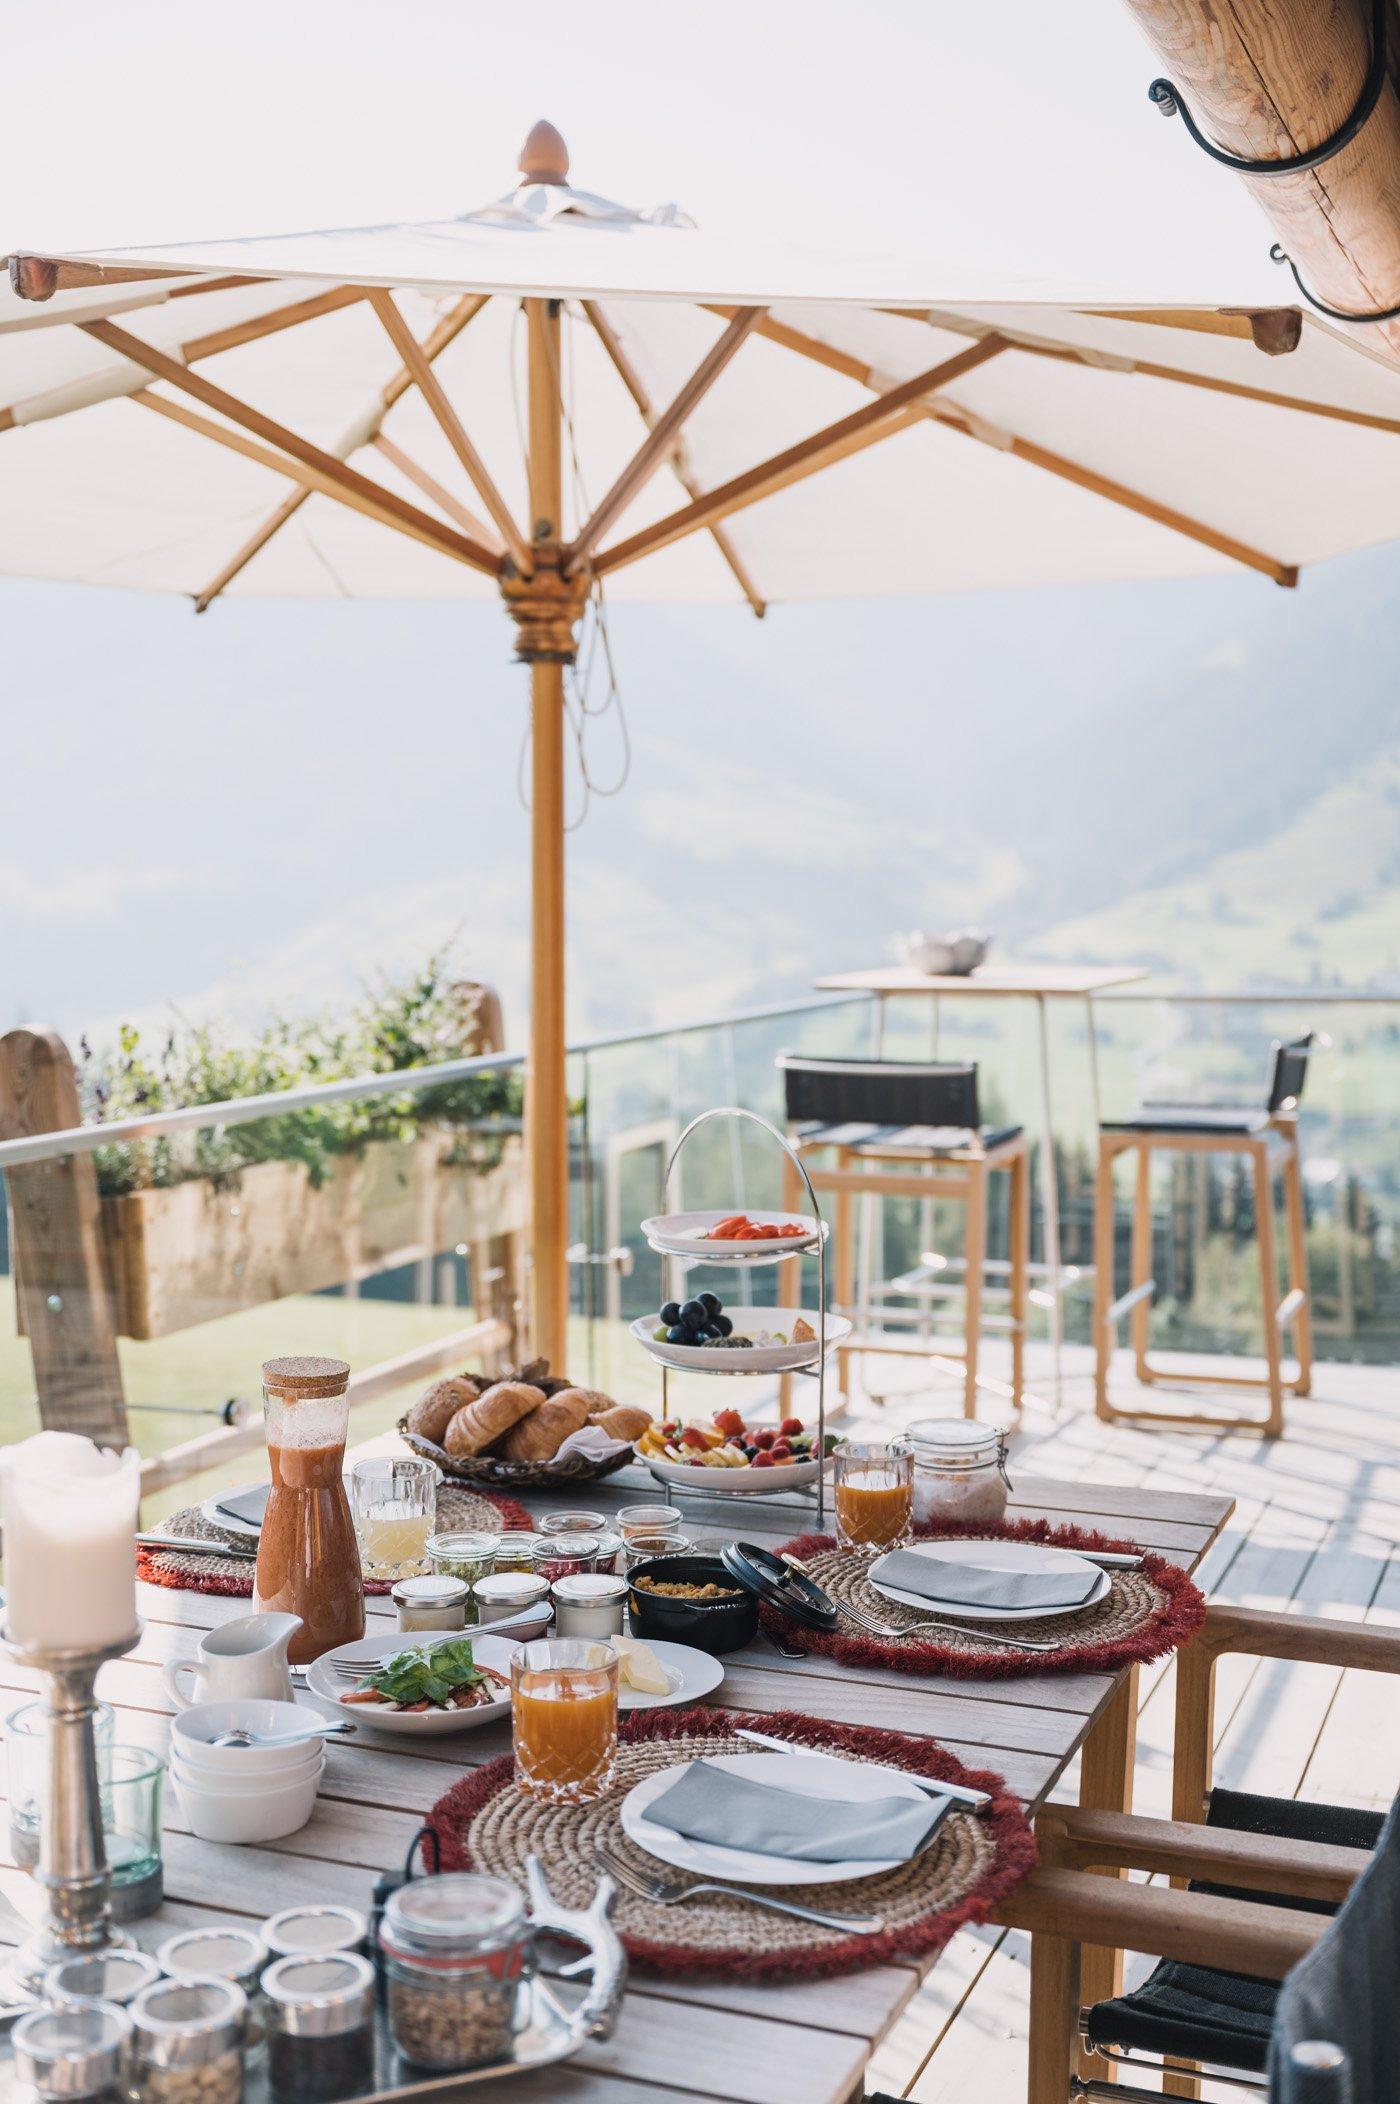 Breakfast at Senhoog luxury holiday homes & chalets in Leogang Salzburg Austria